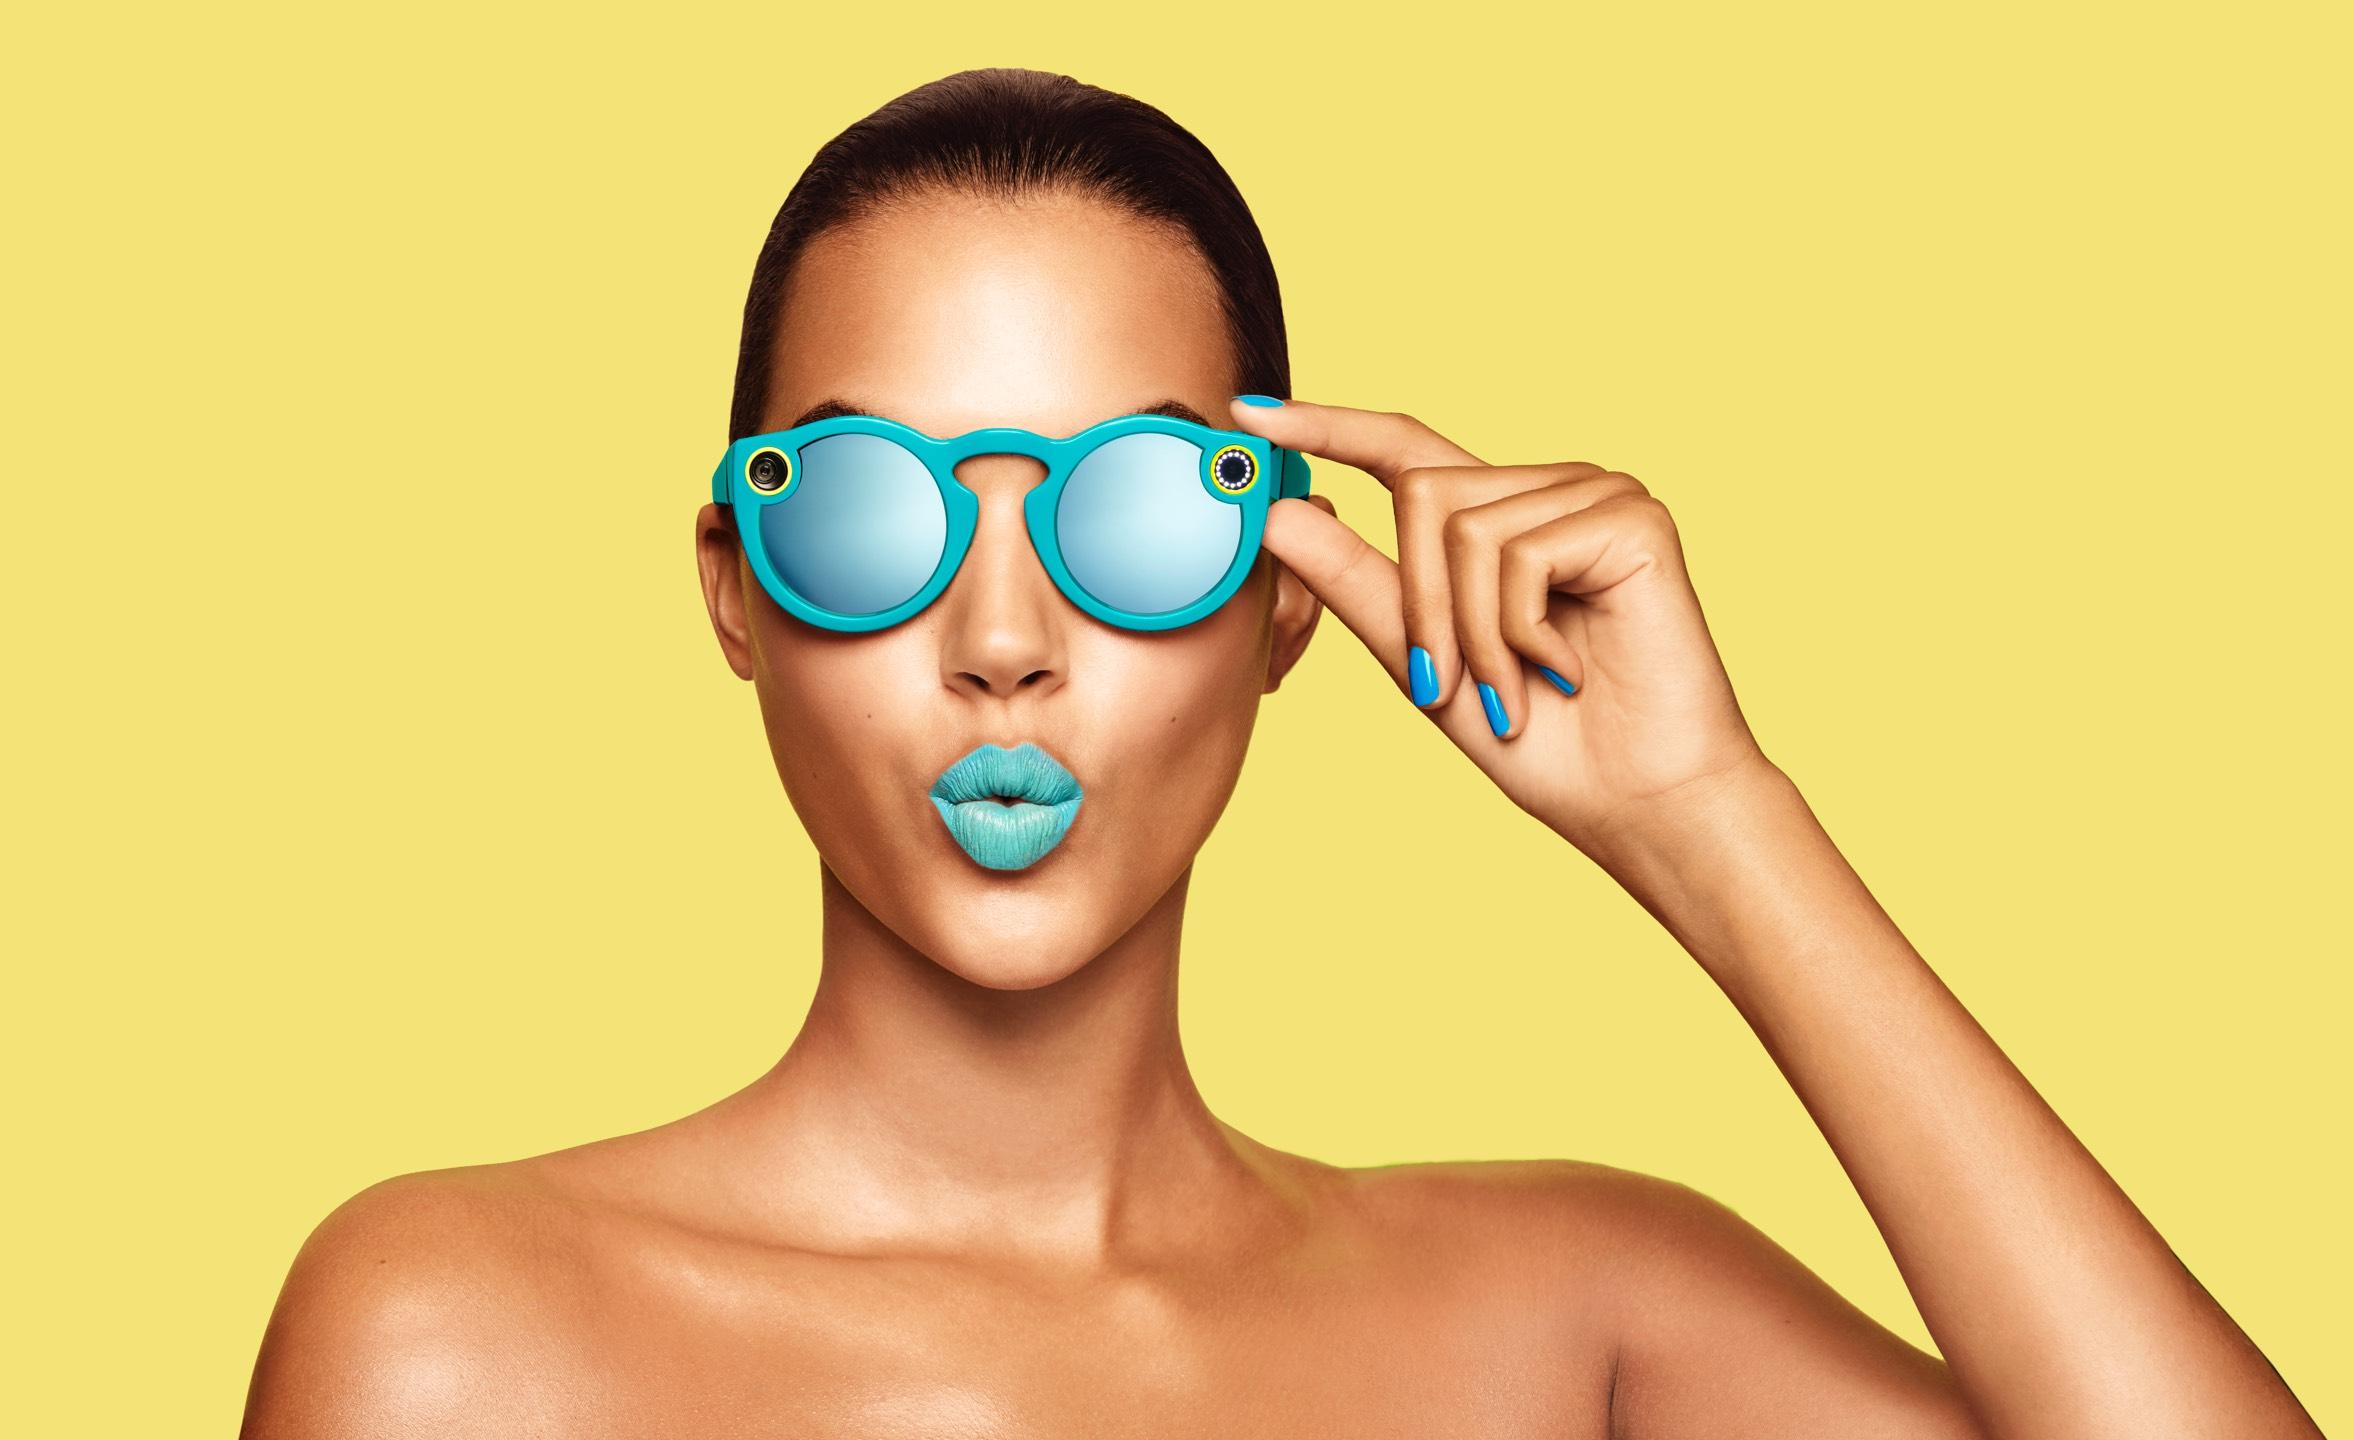 Imagen 2 de la campaña de marketing de la marca Spectacles by Sanp Inc